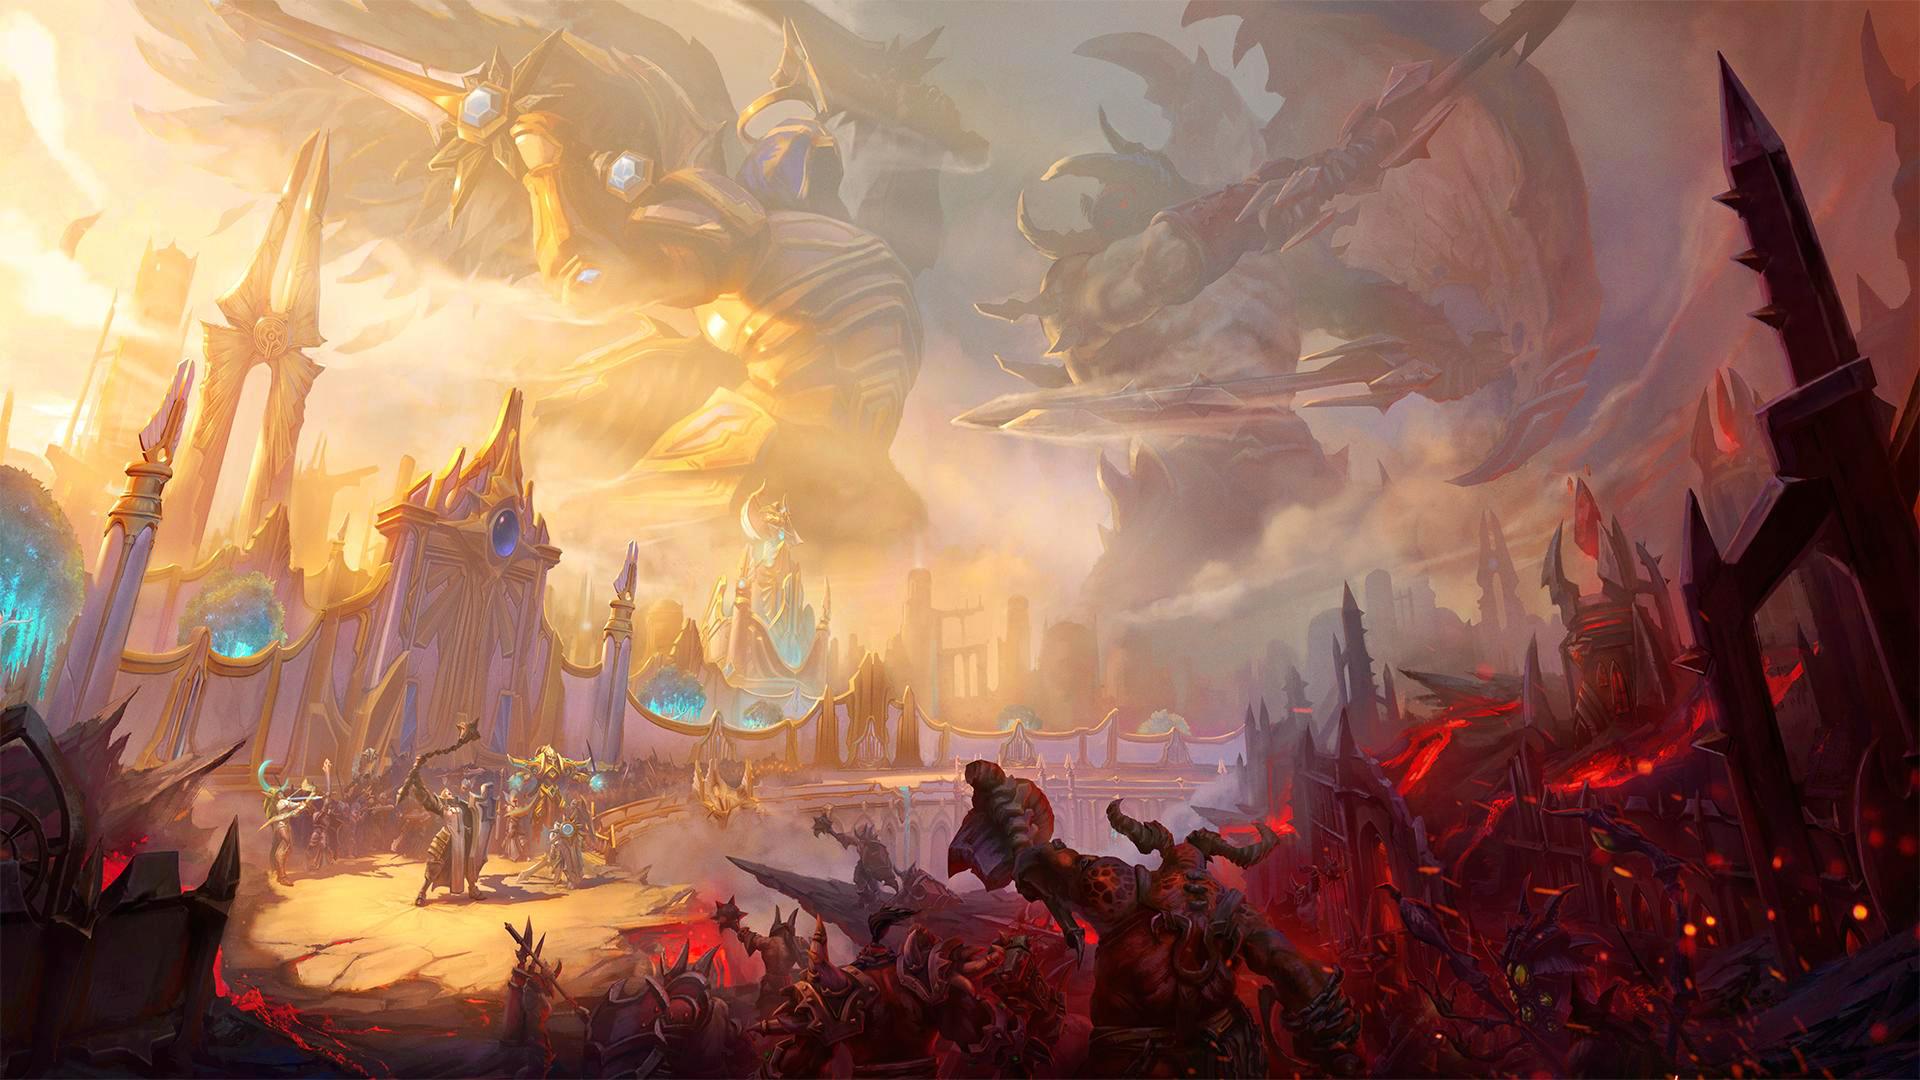 Wallpaper Heroes Of The Storm Blizzard Entertainment Diablo